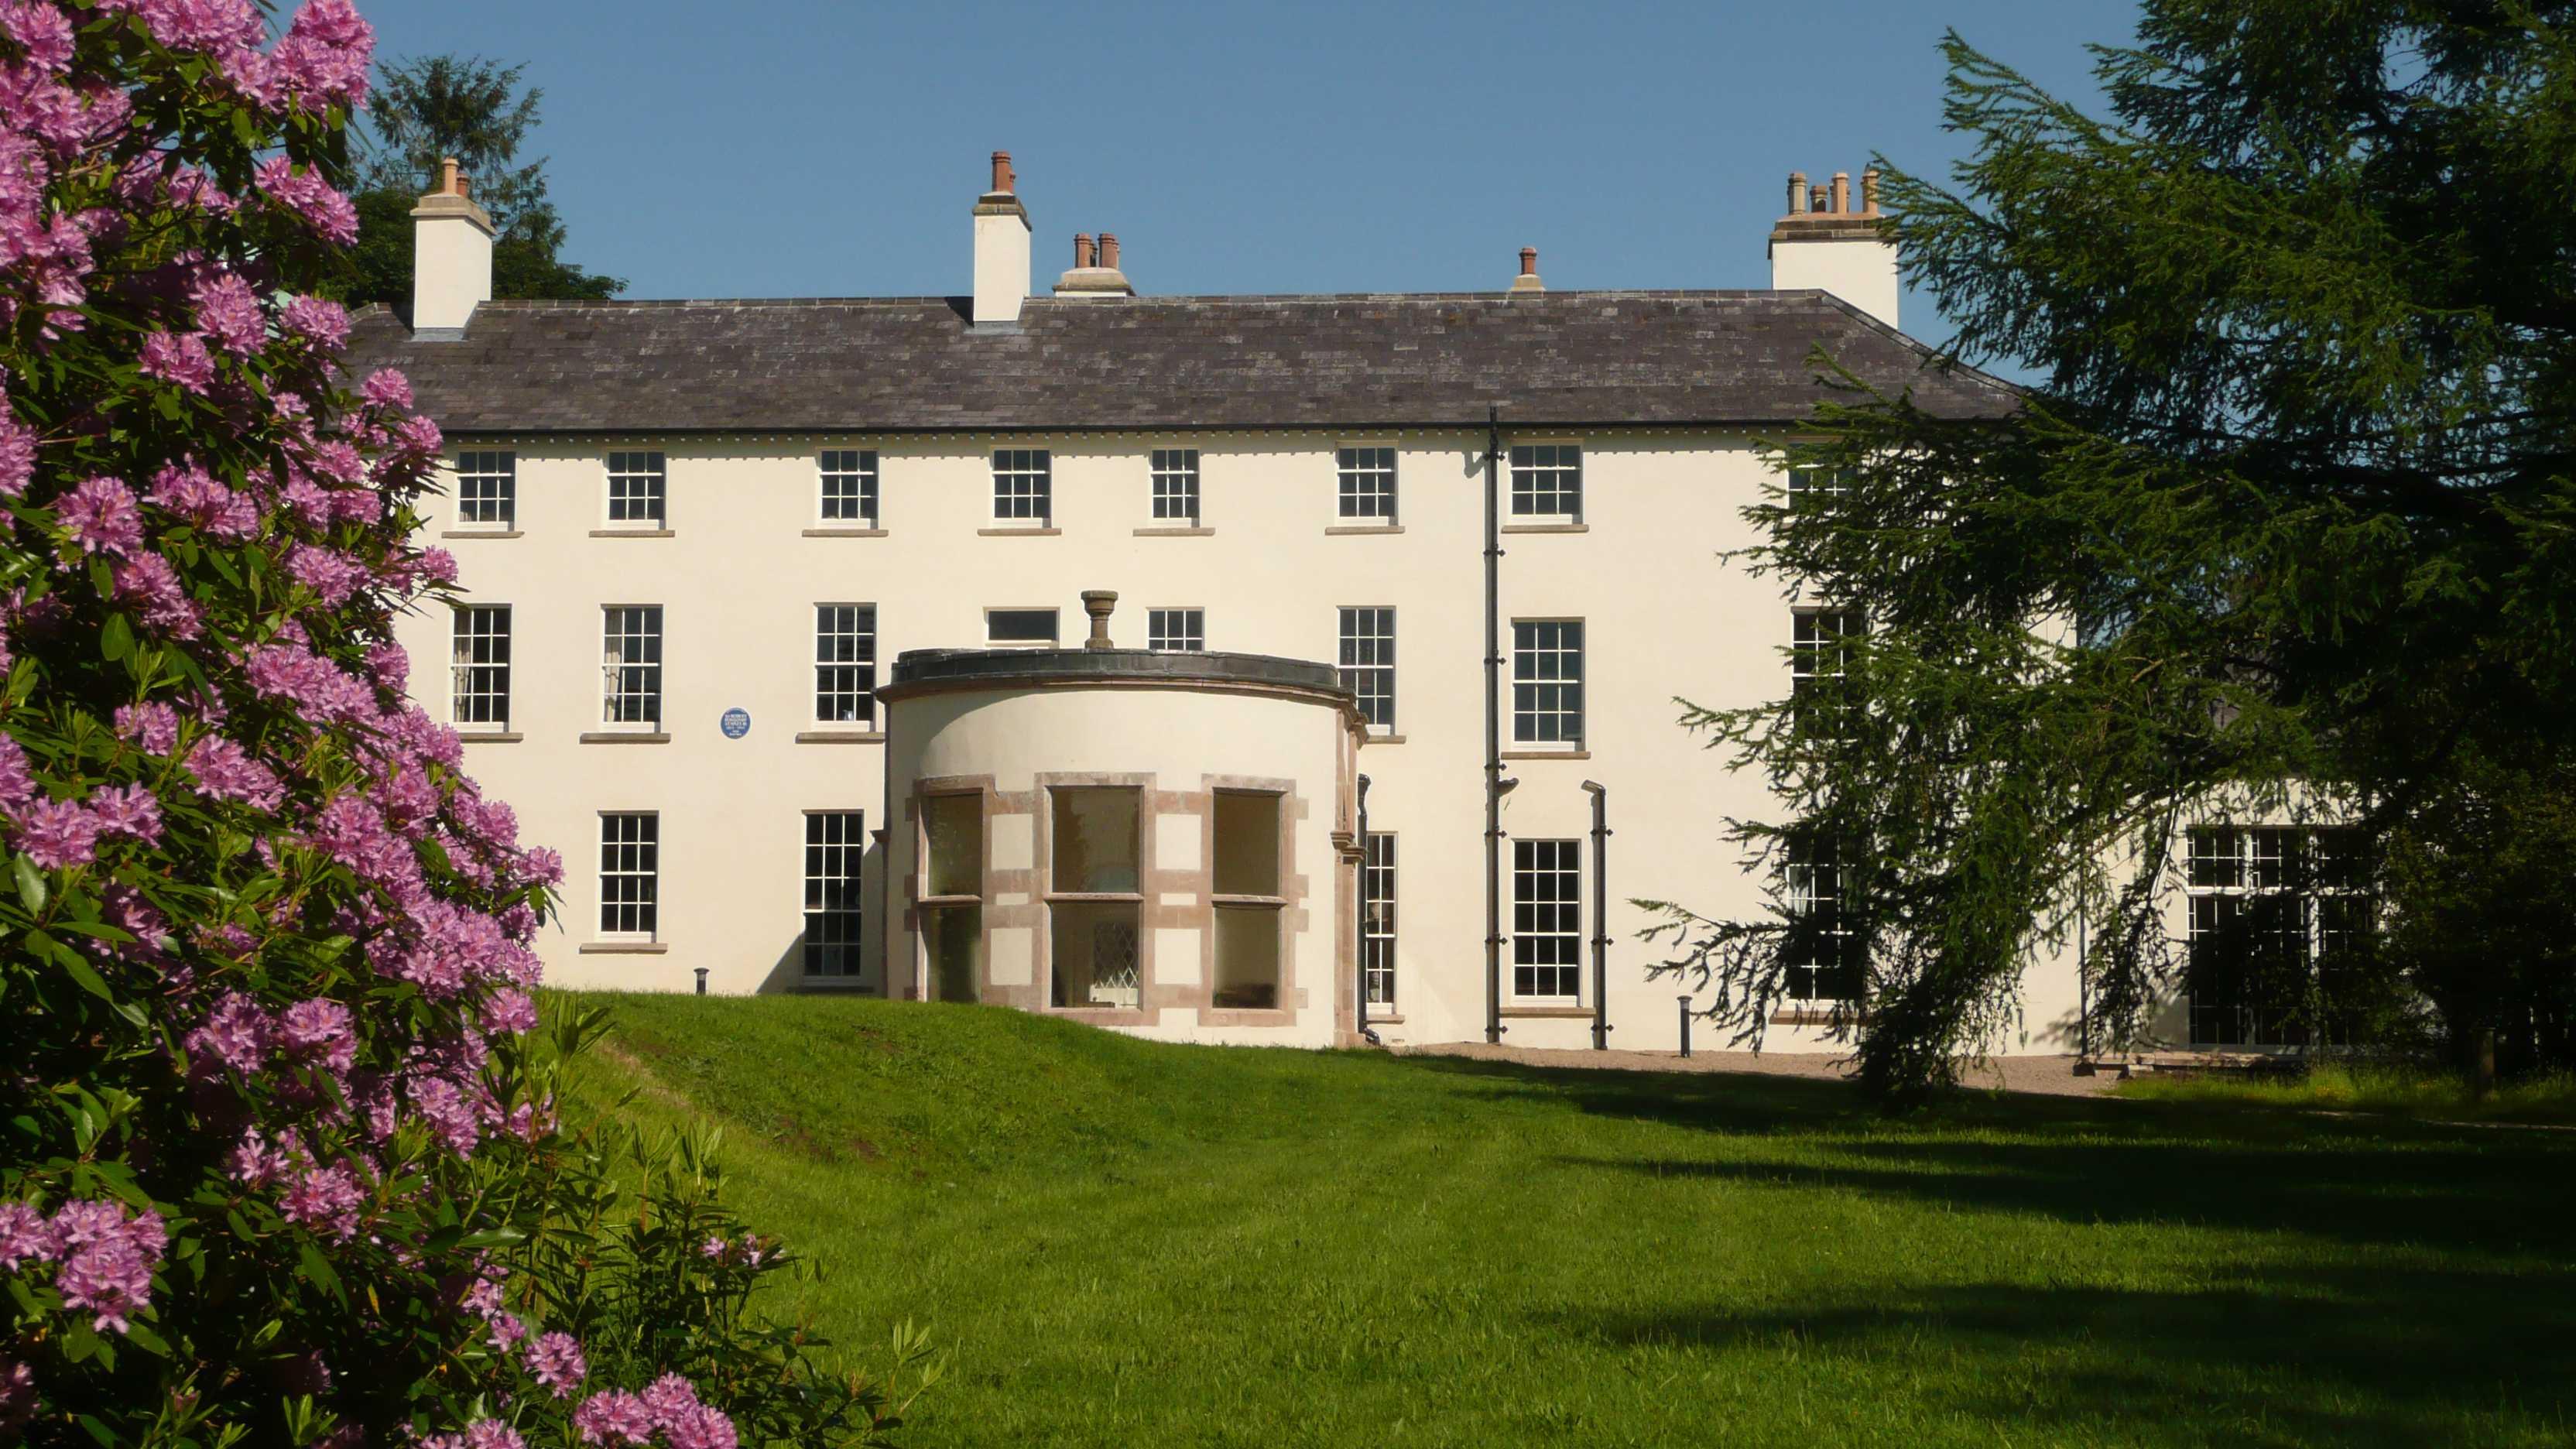 Lissan House, Cookstown, Tyrone, Northern Ireland